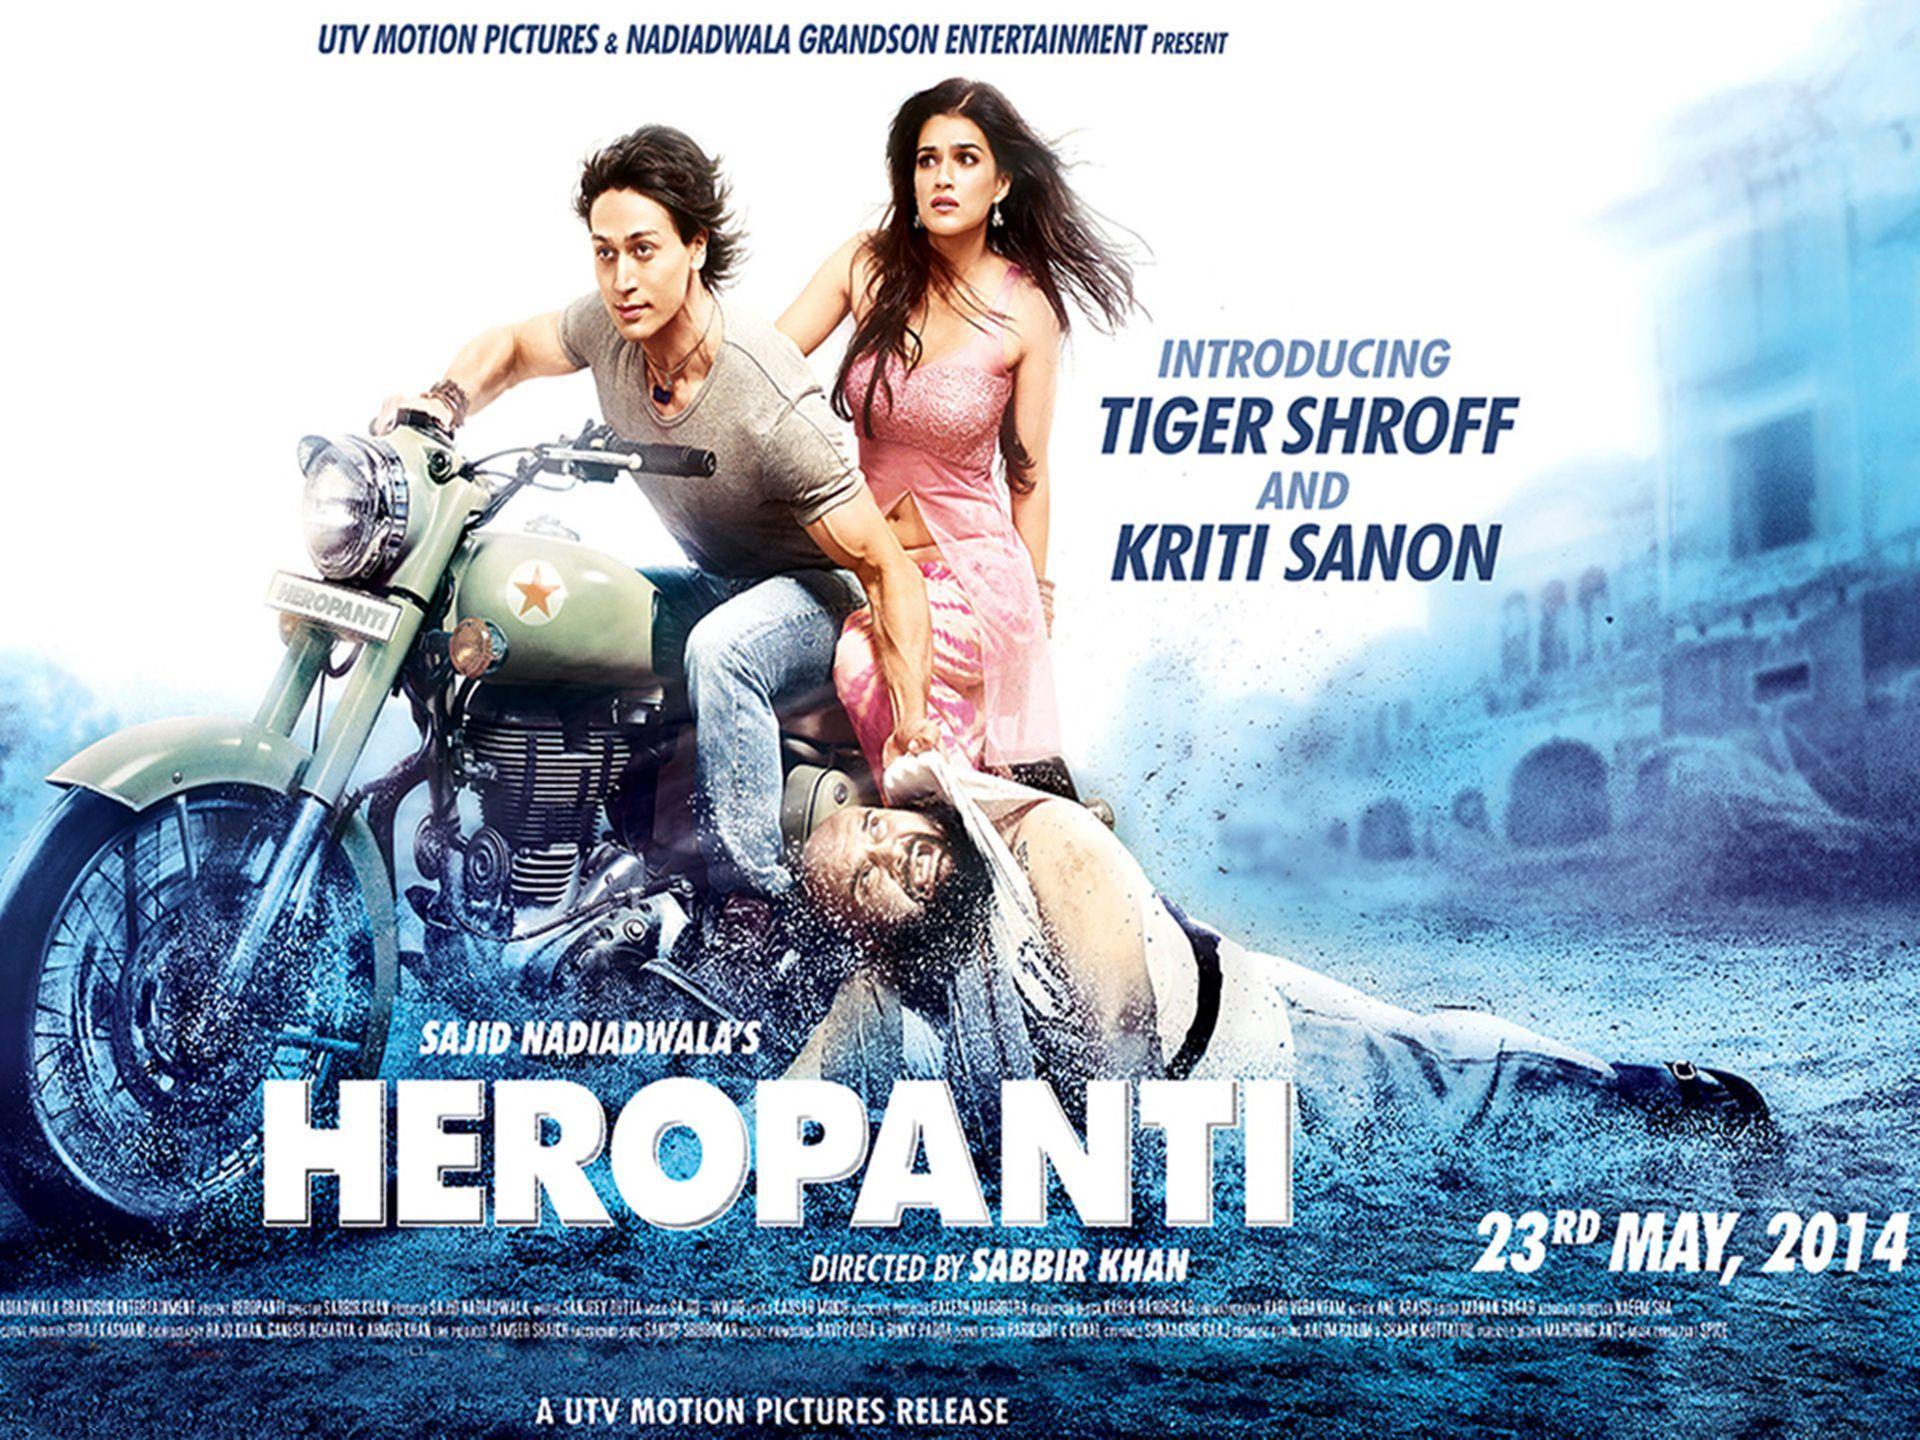 Heropanti Movie HD Wallpapers Tiger shroff, Download